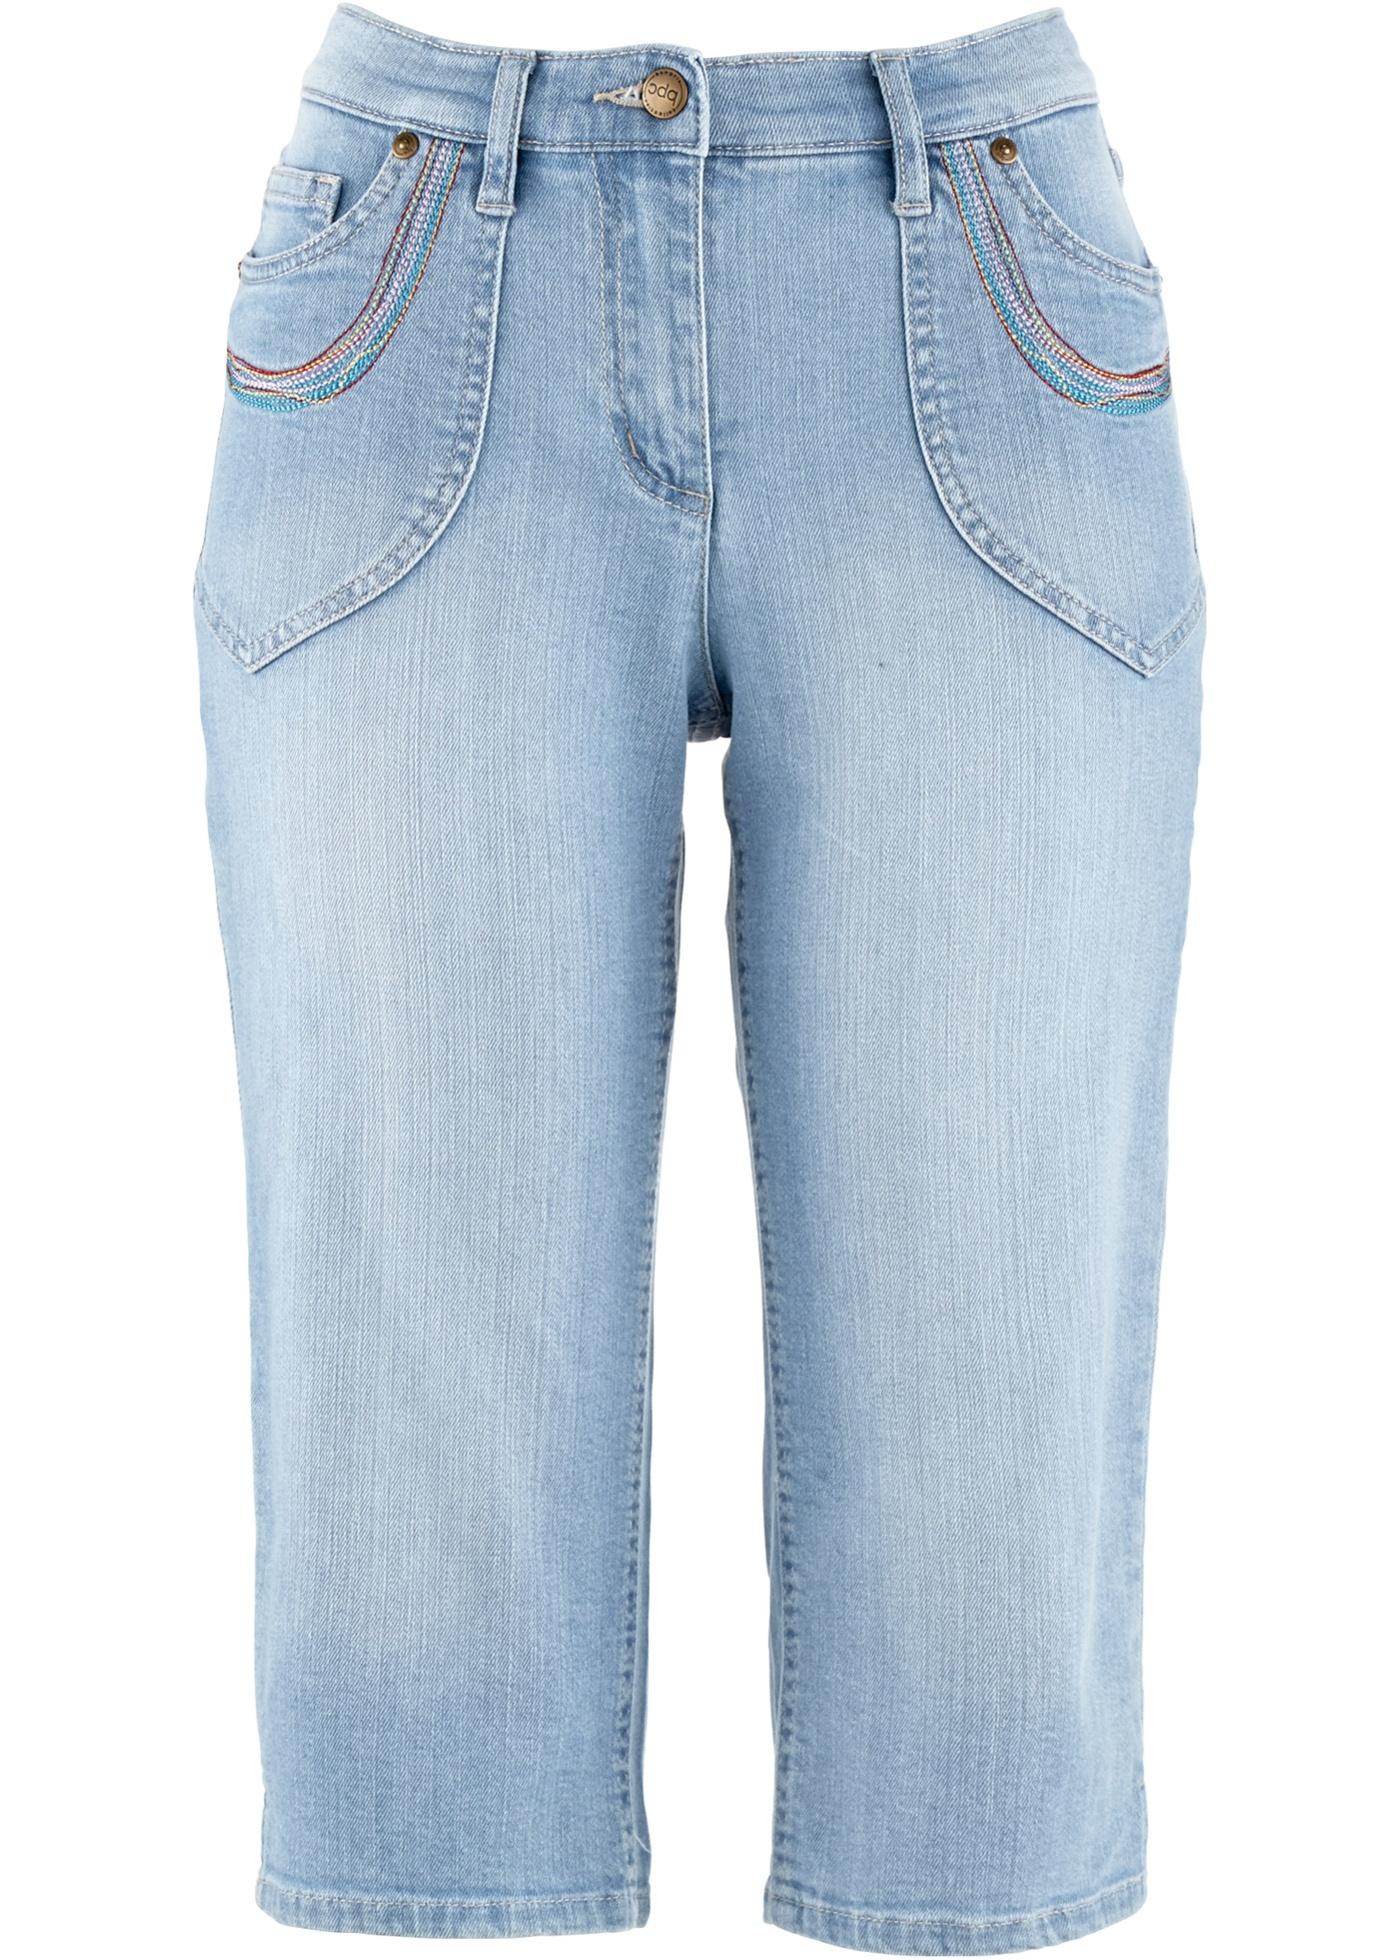 Hosen - Capri Stretch Jeans › bonprix › blau  - Onlineshop Bonprix